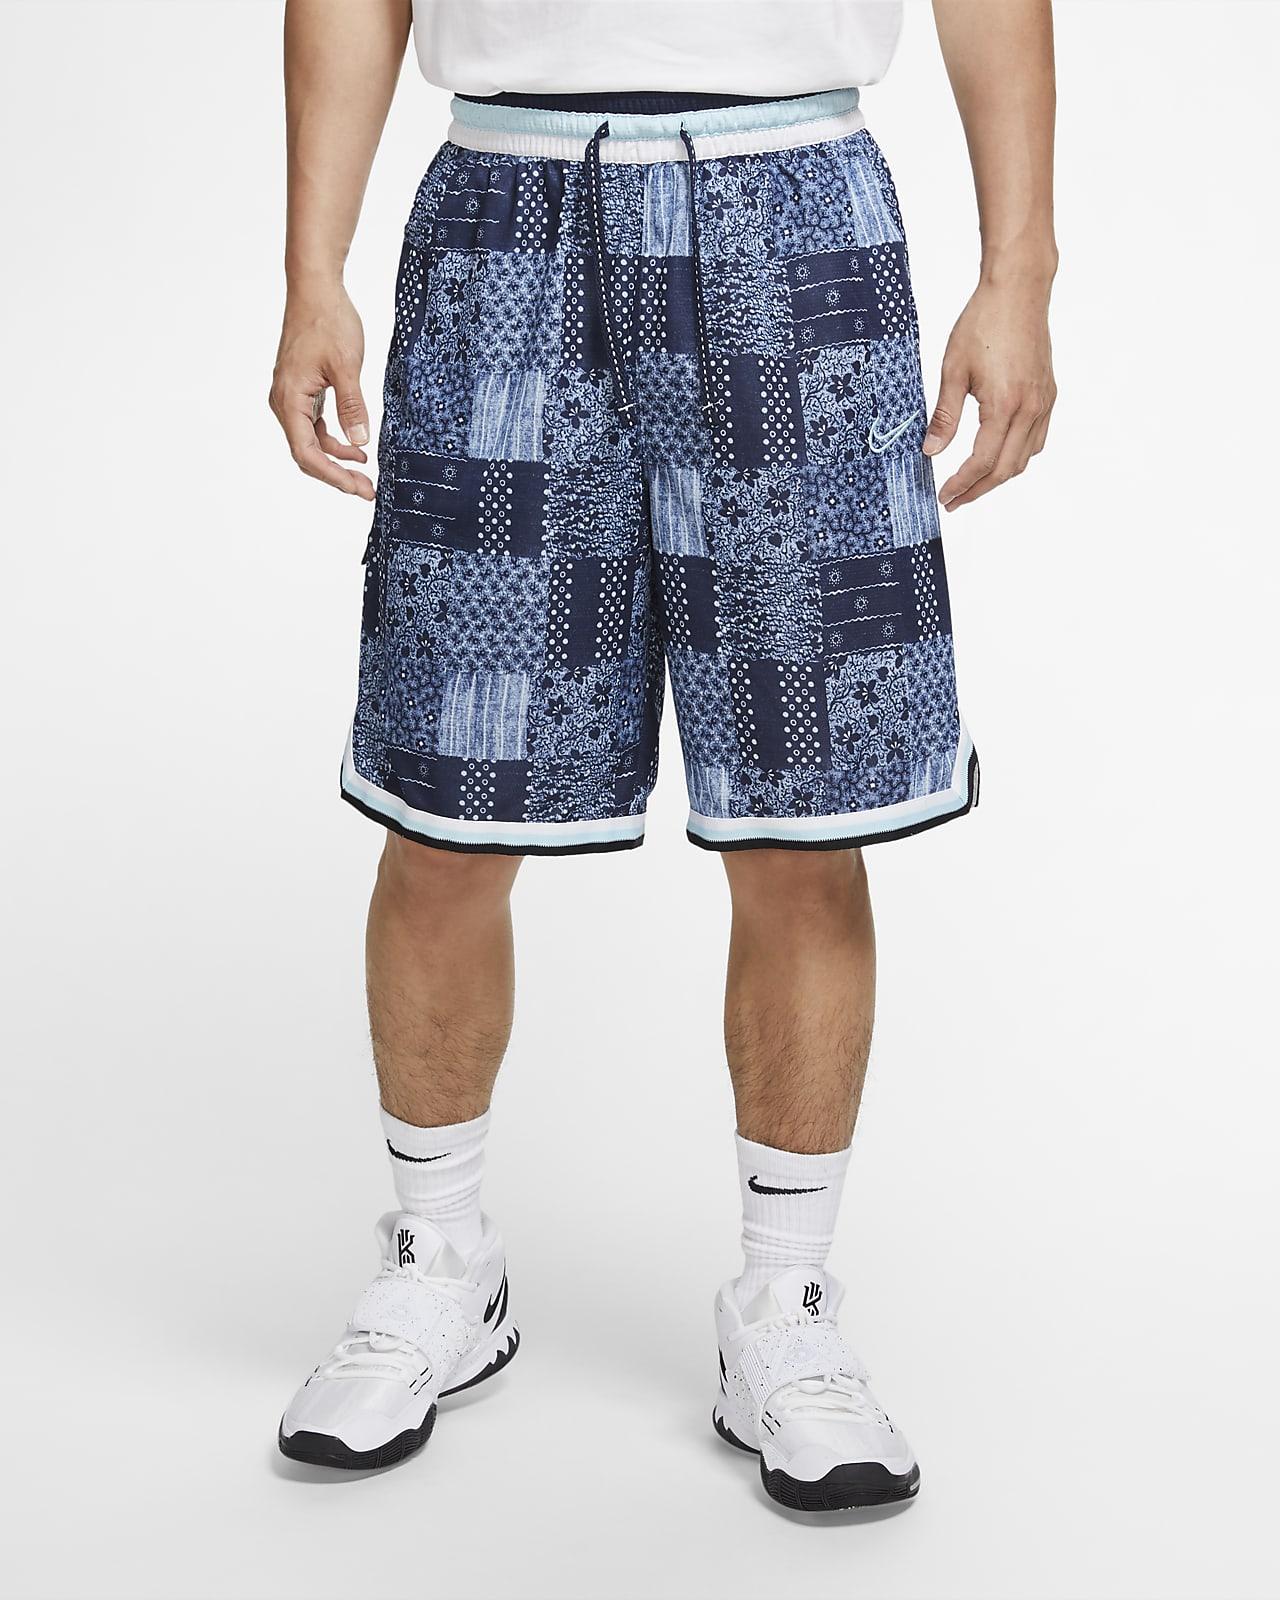 Nike DNA Men's Basketball Shorts